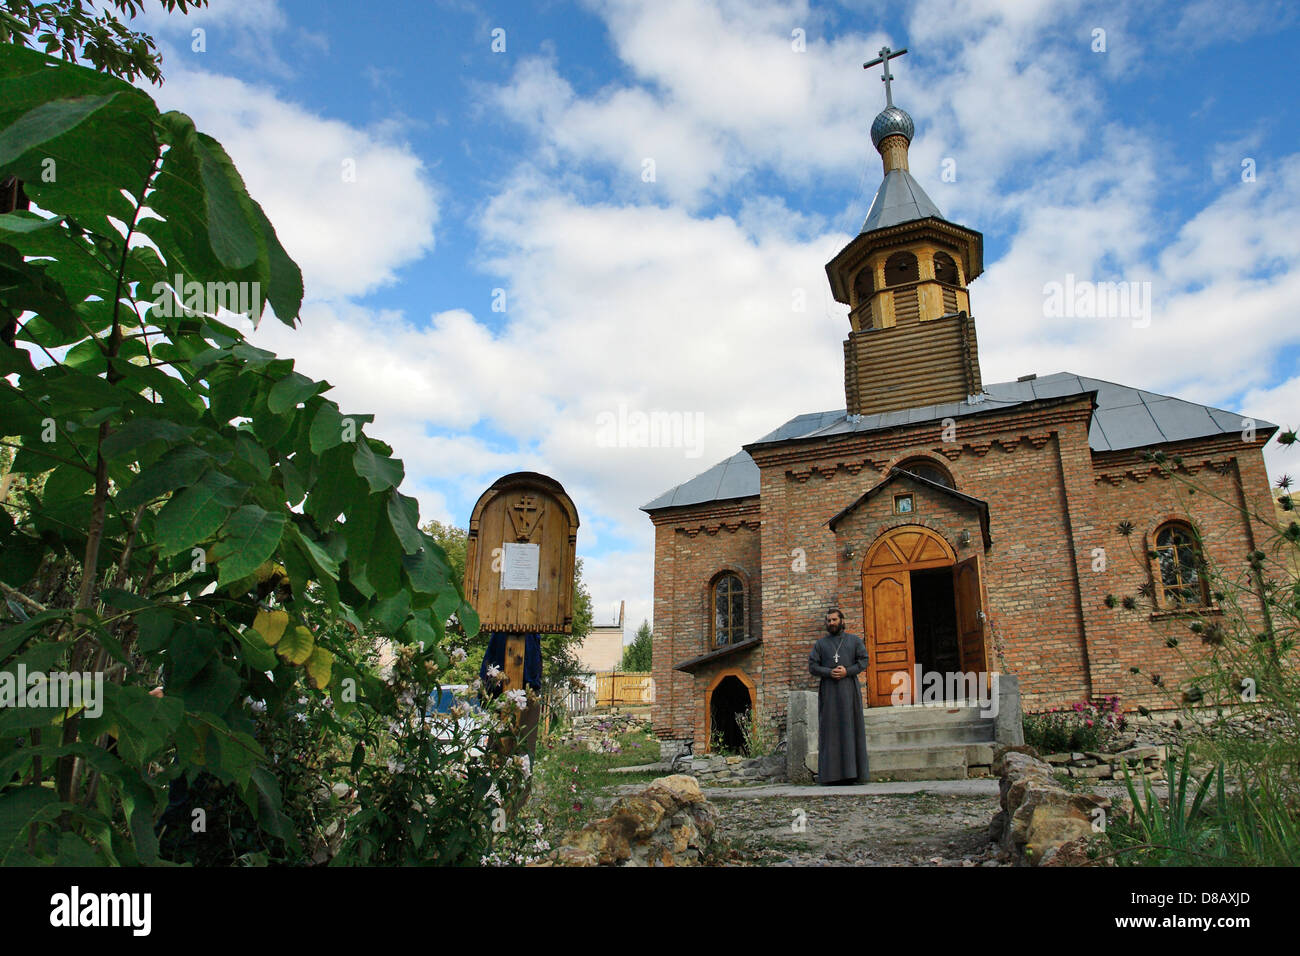 Ust Kamenogorsk region, Rider town - Russian orthodox church - Stock Image